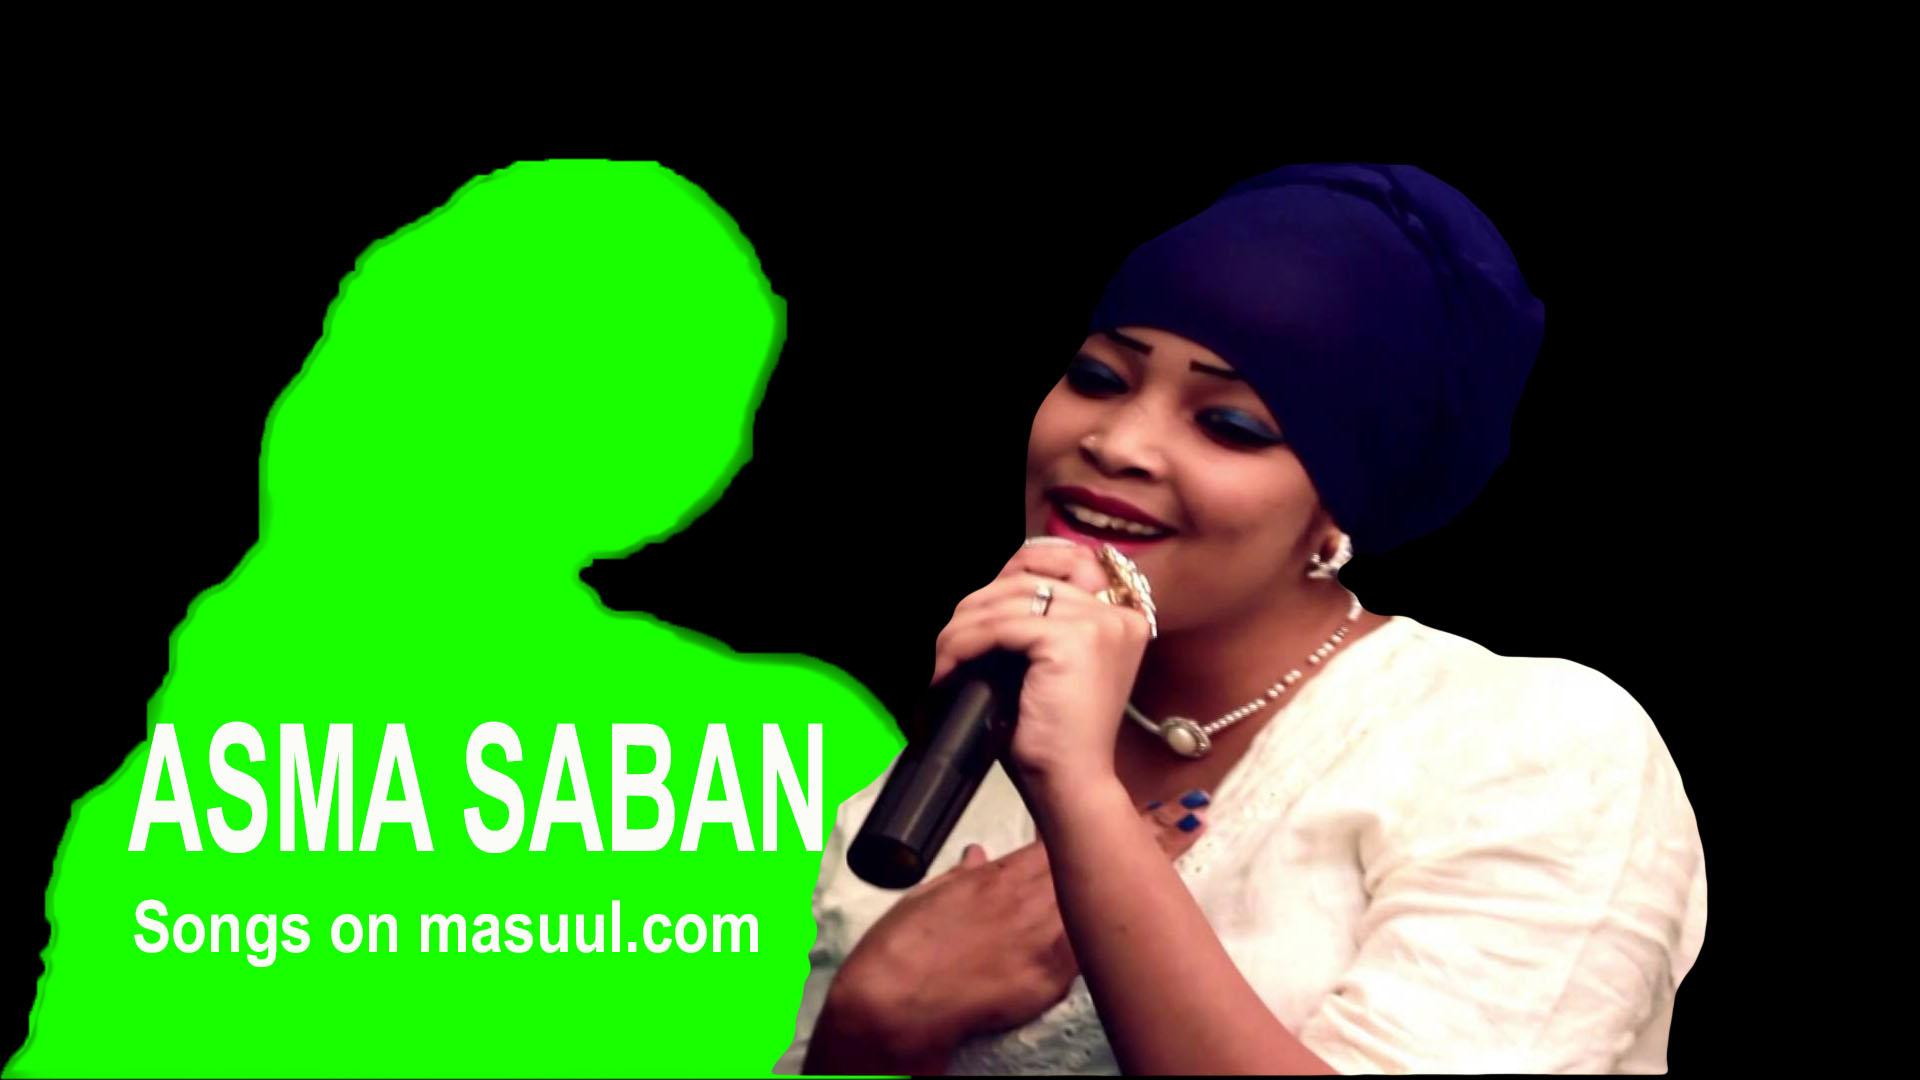 Asma Saban songs